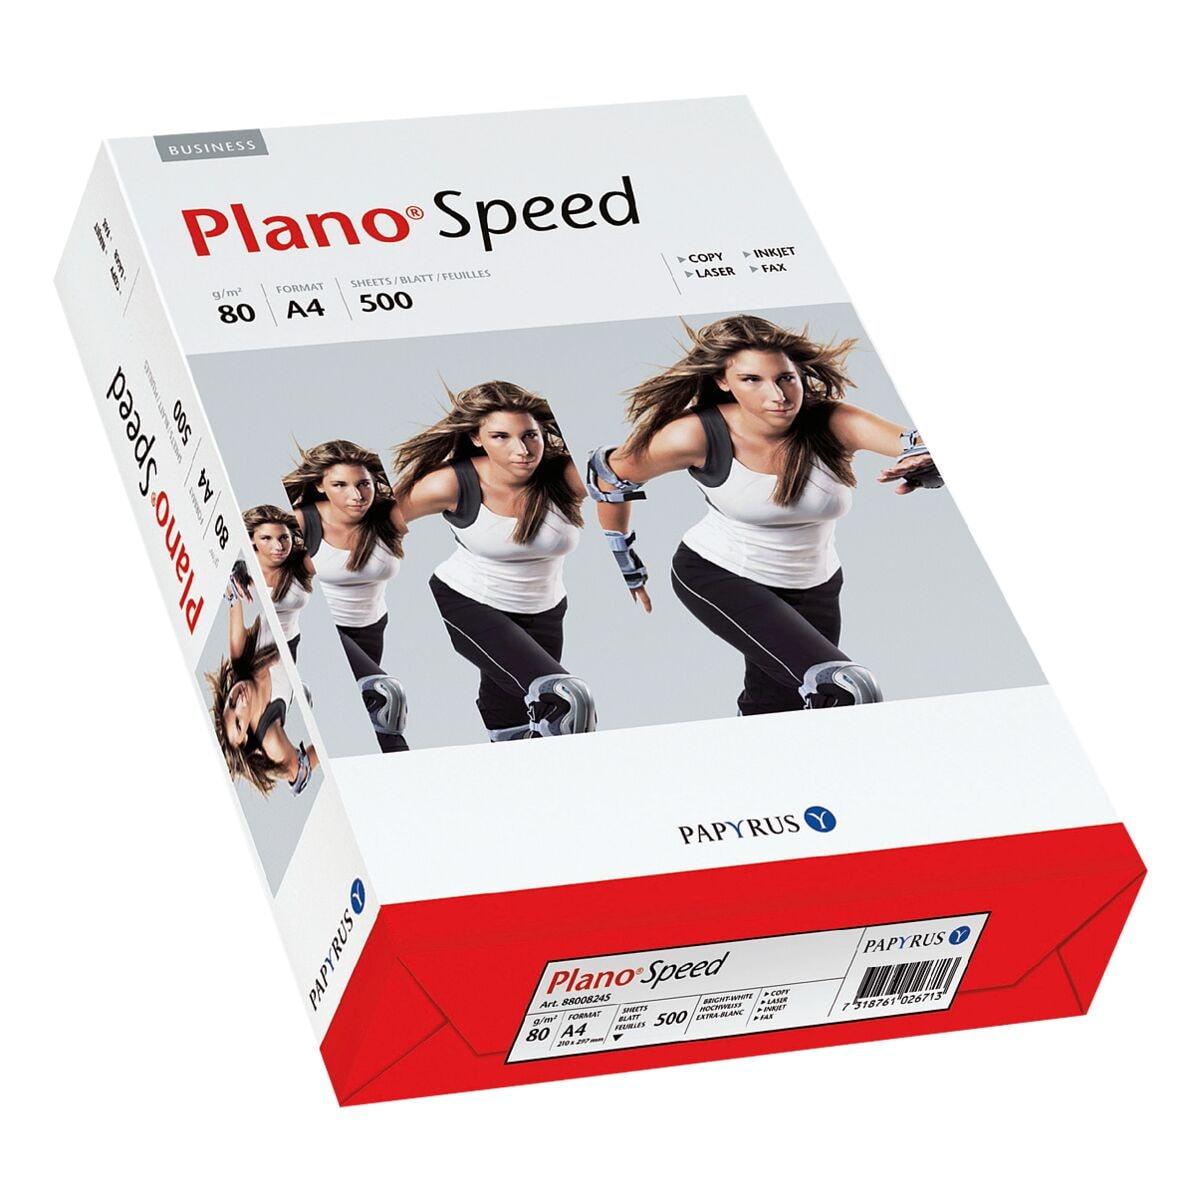 Kopierpapier A4 Plano Plano Speed - 500 Blatt gesamt, 80g/qm